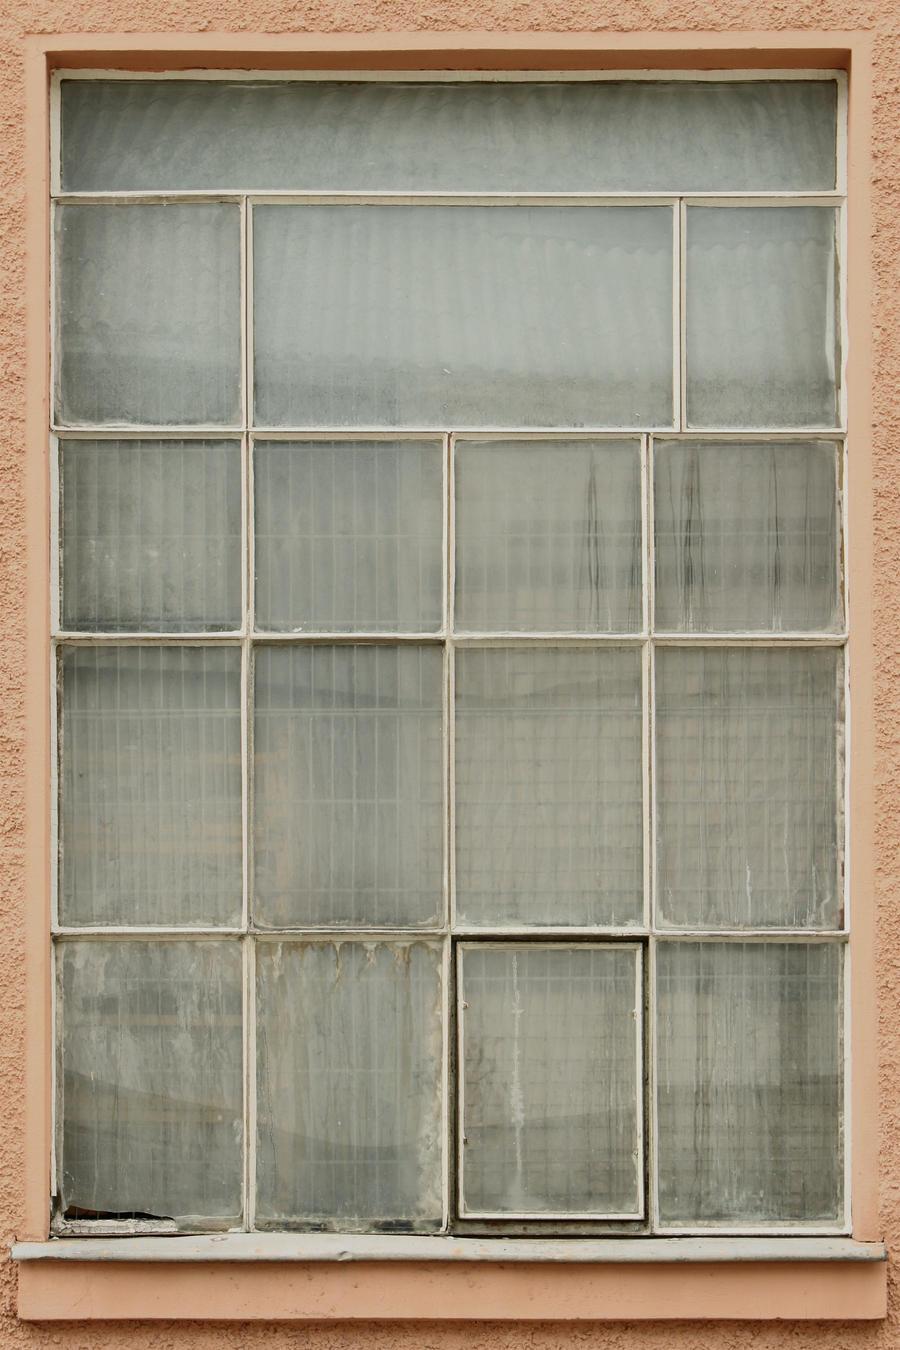 Window Texture 11 By Agf81 On Deviantart